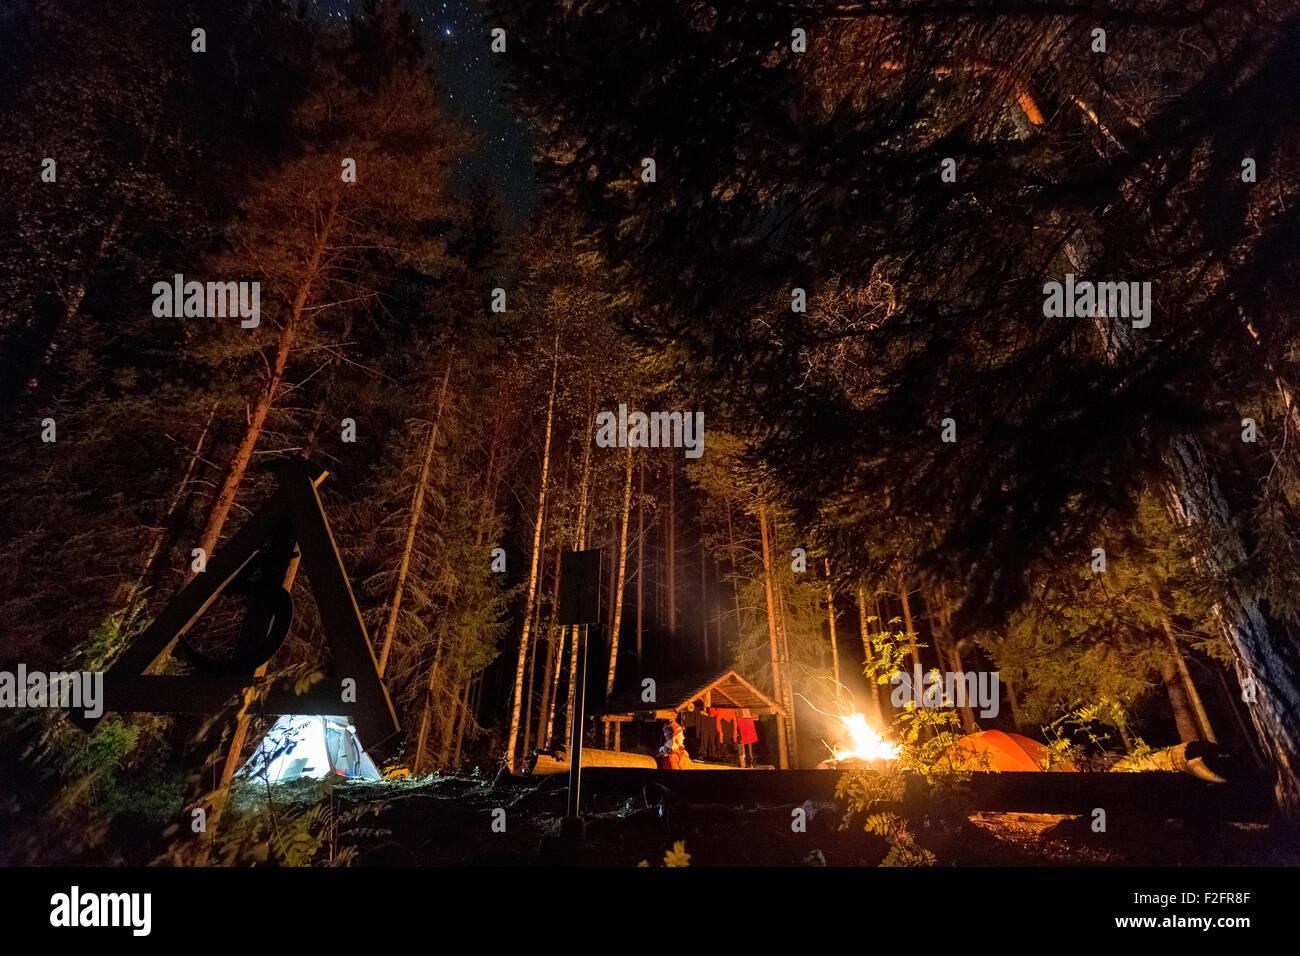 Camping Lylyniemi, Jämsä, Finlandia, Europa, UE Imagen De Stock